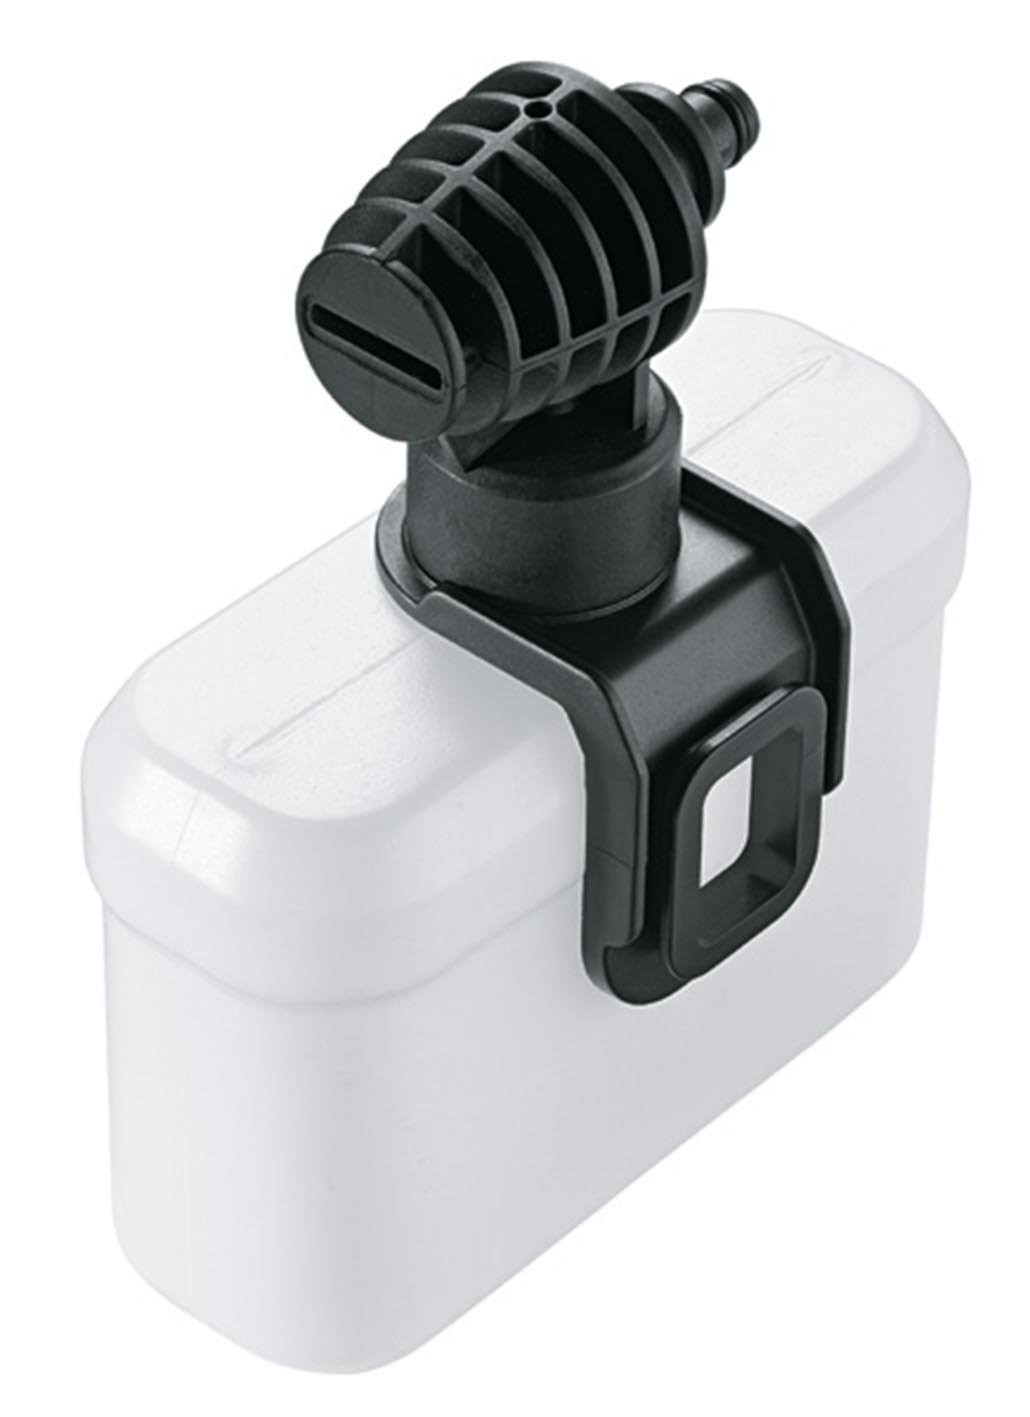 Bosch High Pressure Foam Nozzle (for Aquatak) F016800509